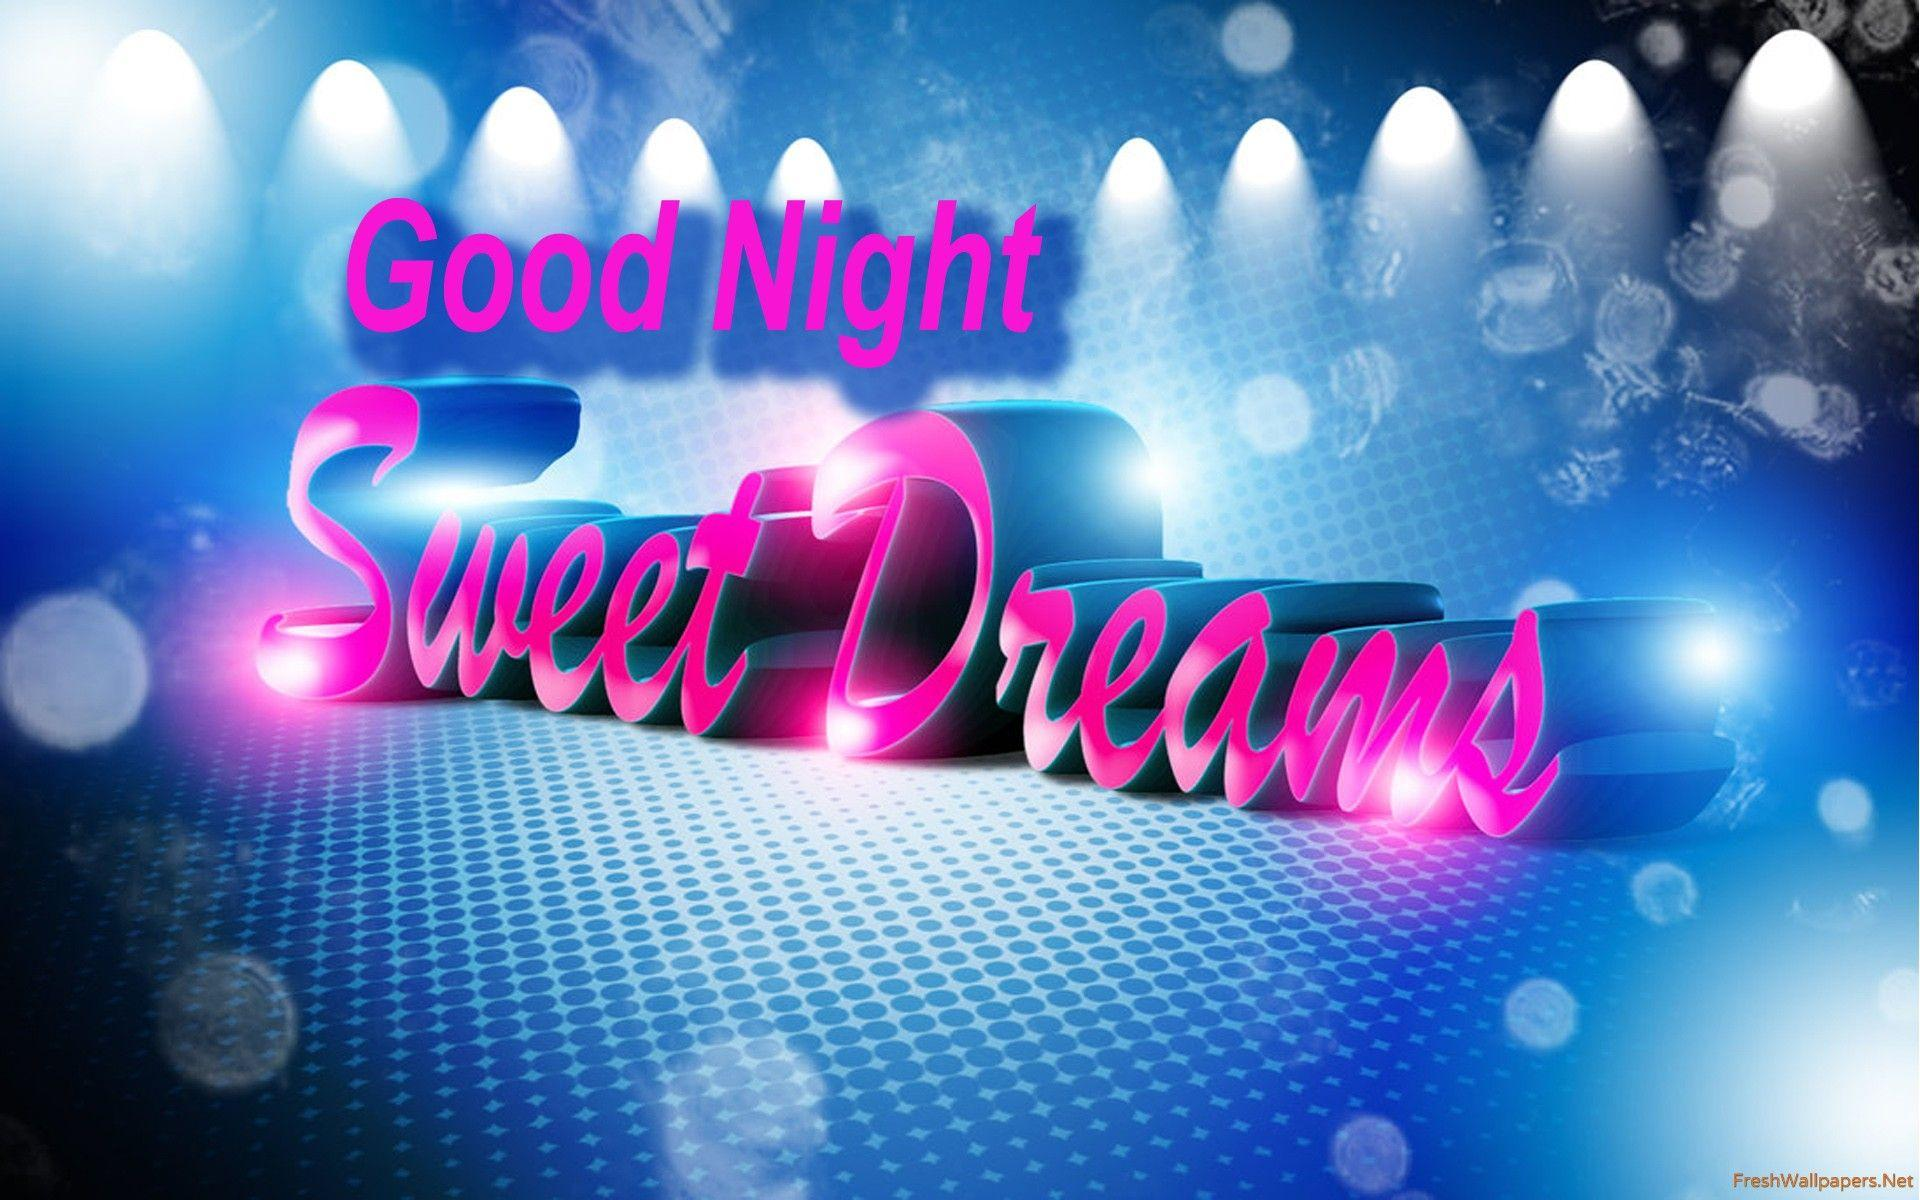 Sweet Dreams Wallpapers - Wallpaper Cave